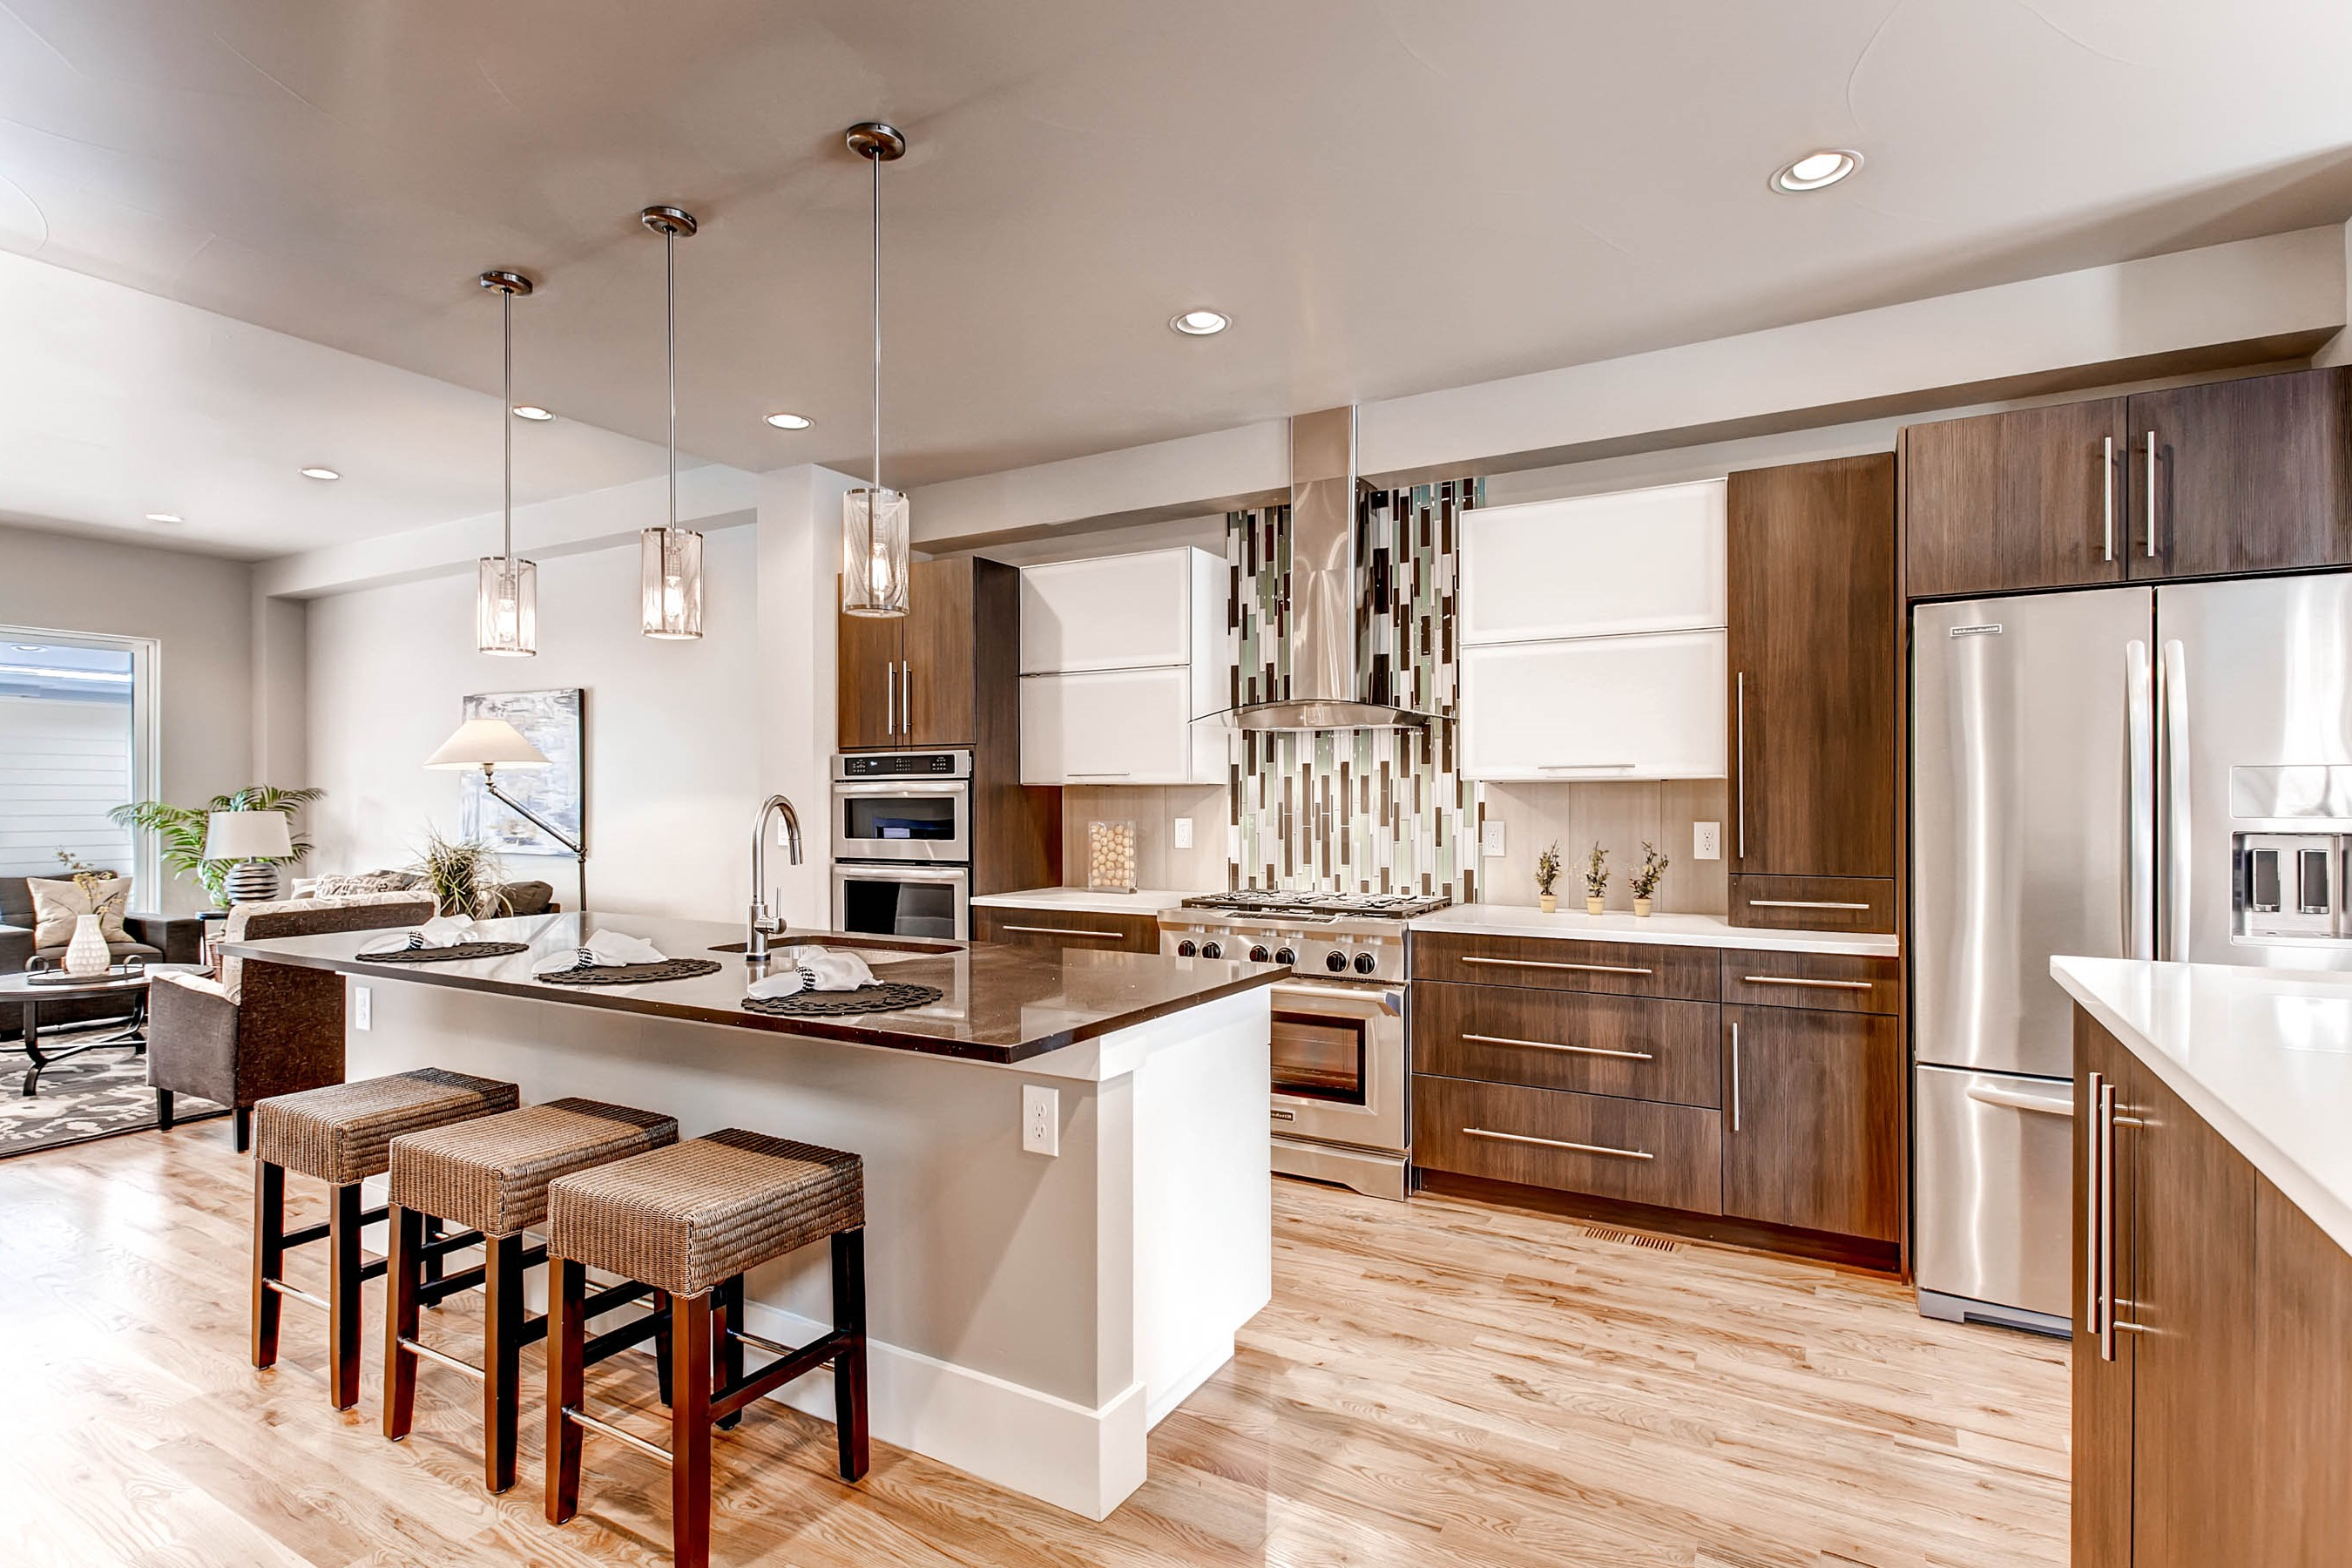 A Jackson Design Build kitchen.